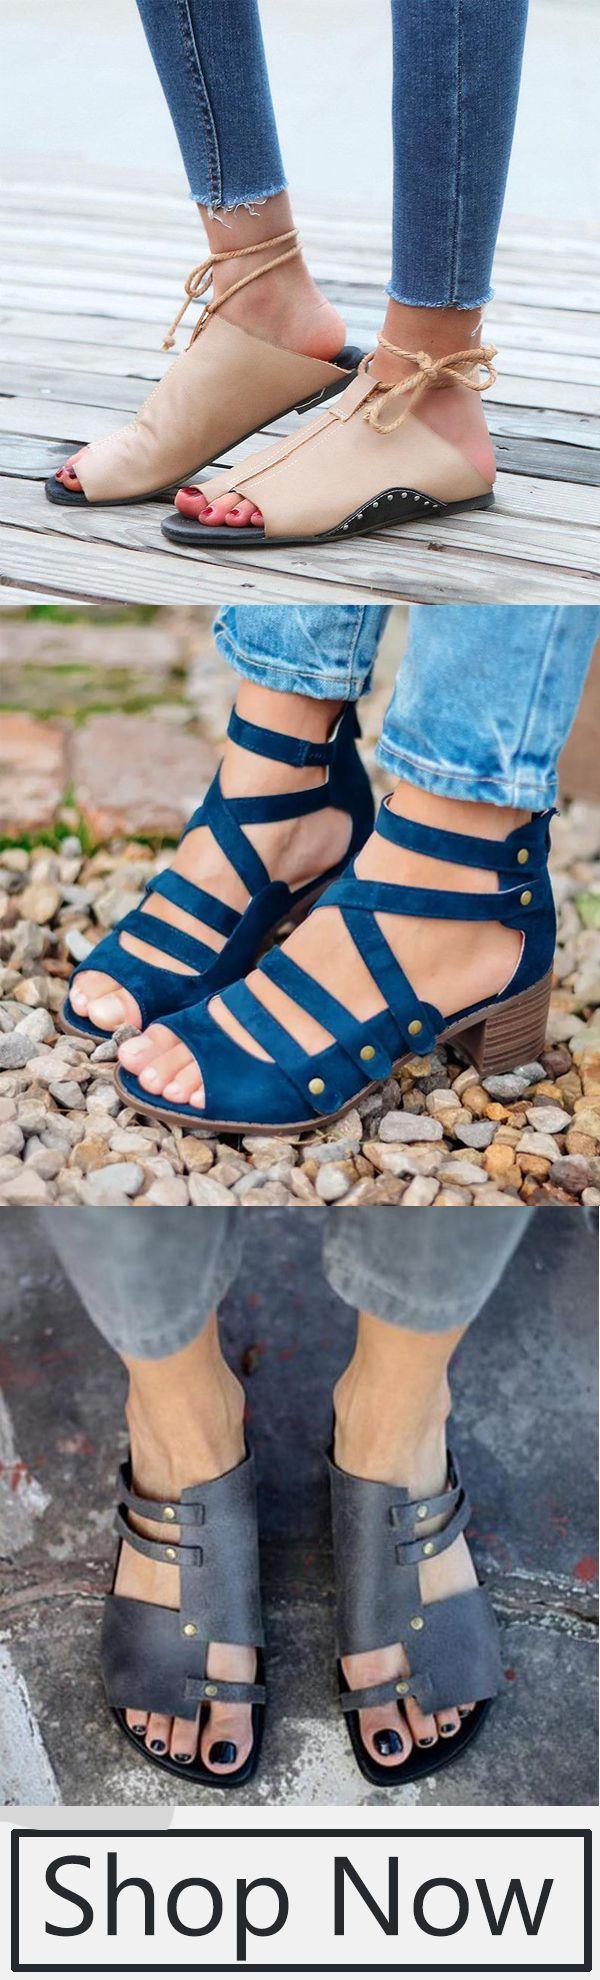 Sandals !2019 Trendy Shoes !   Fashion